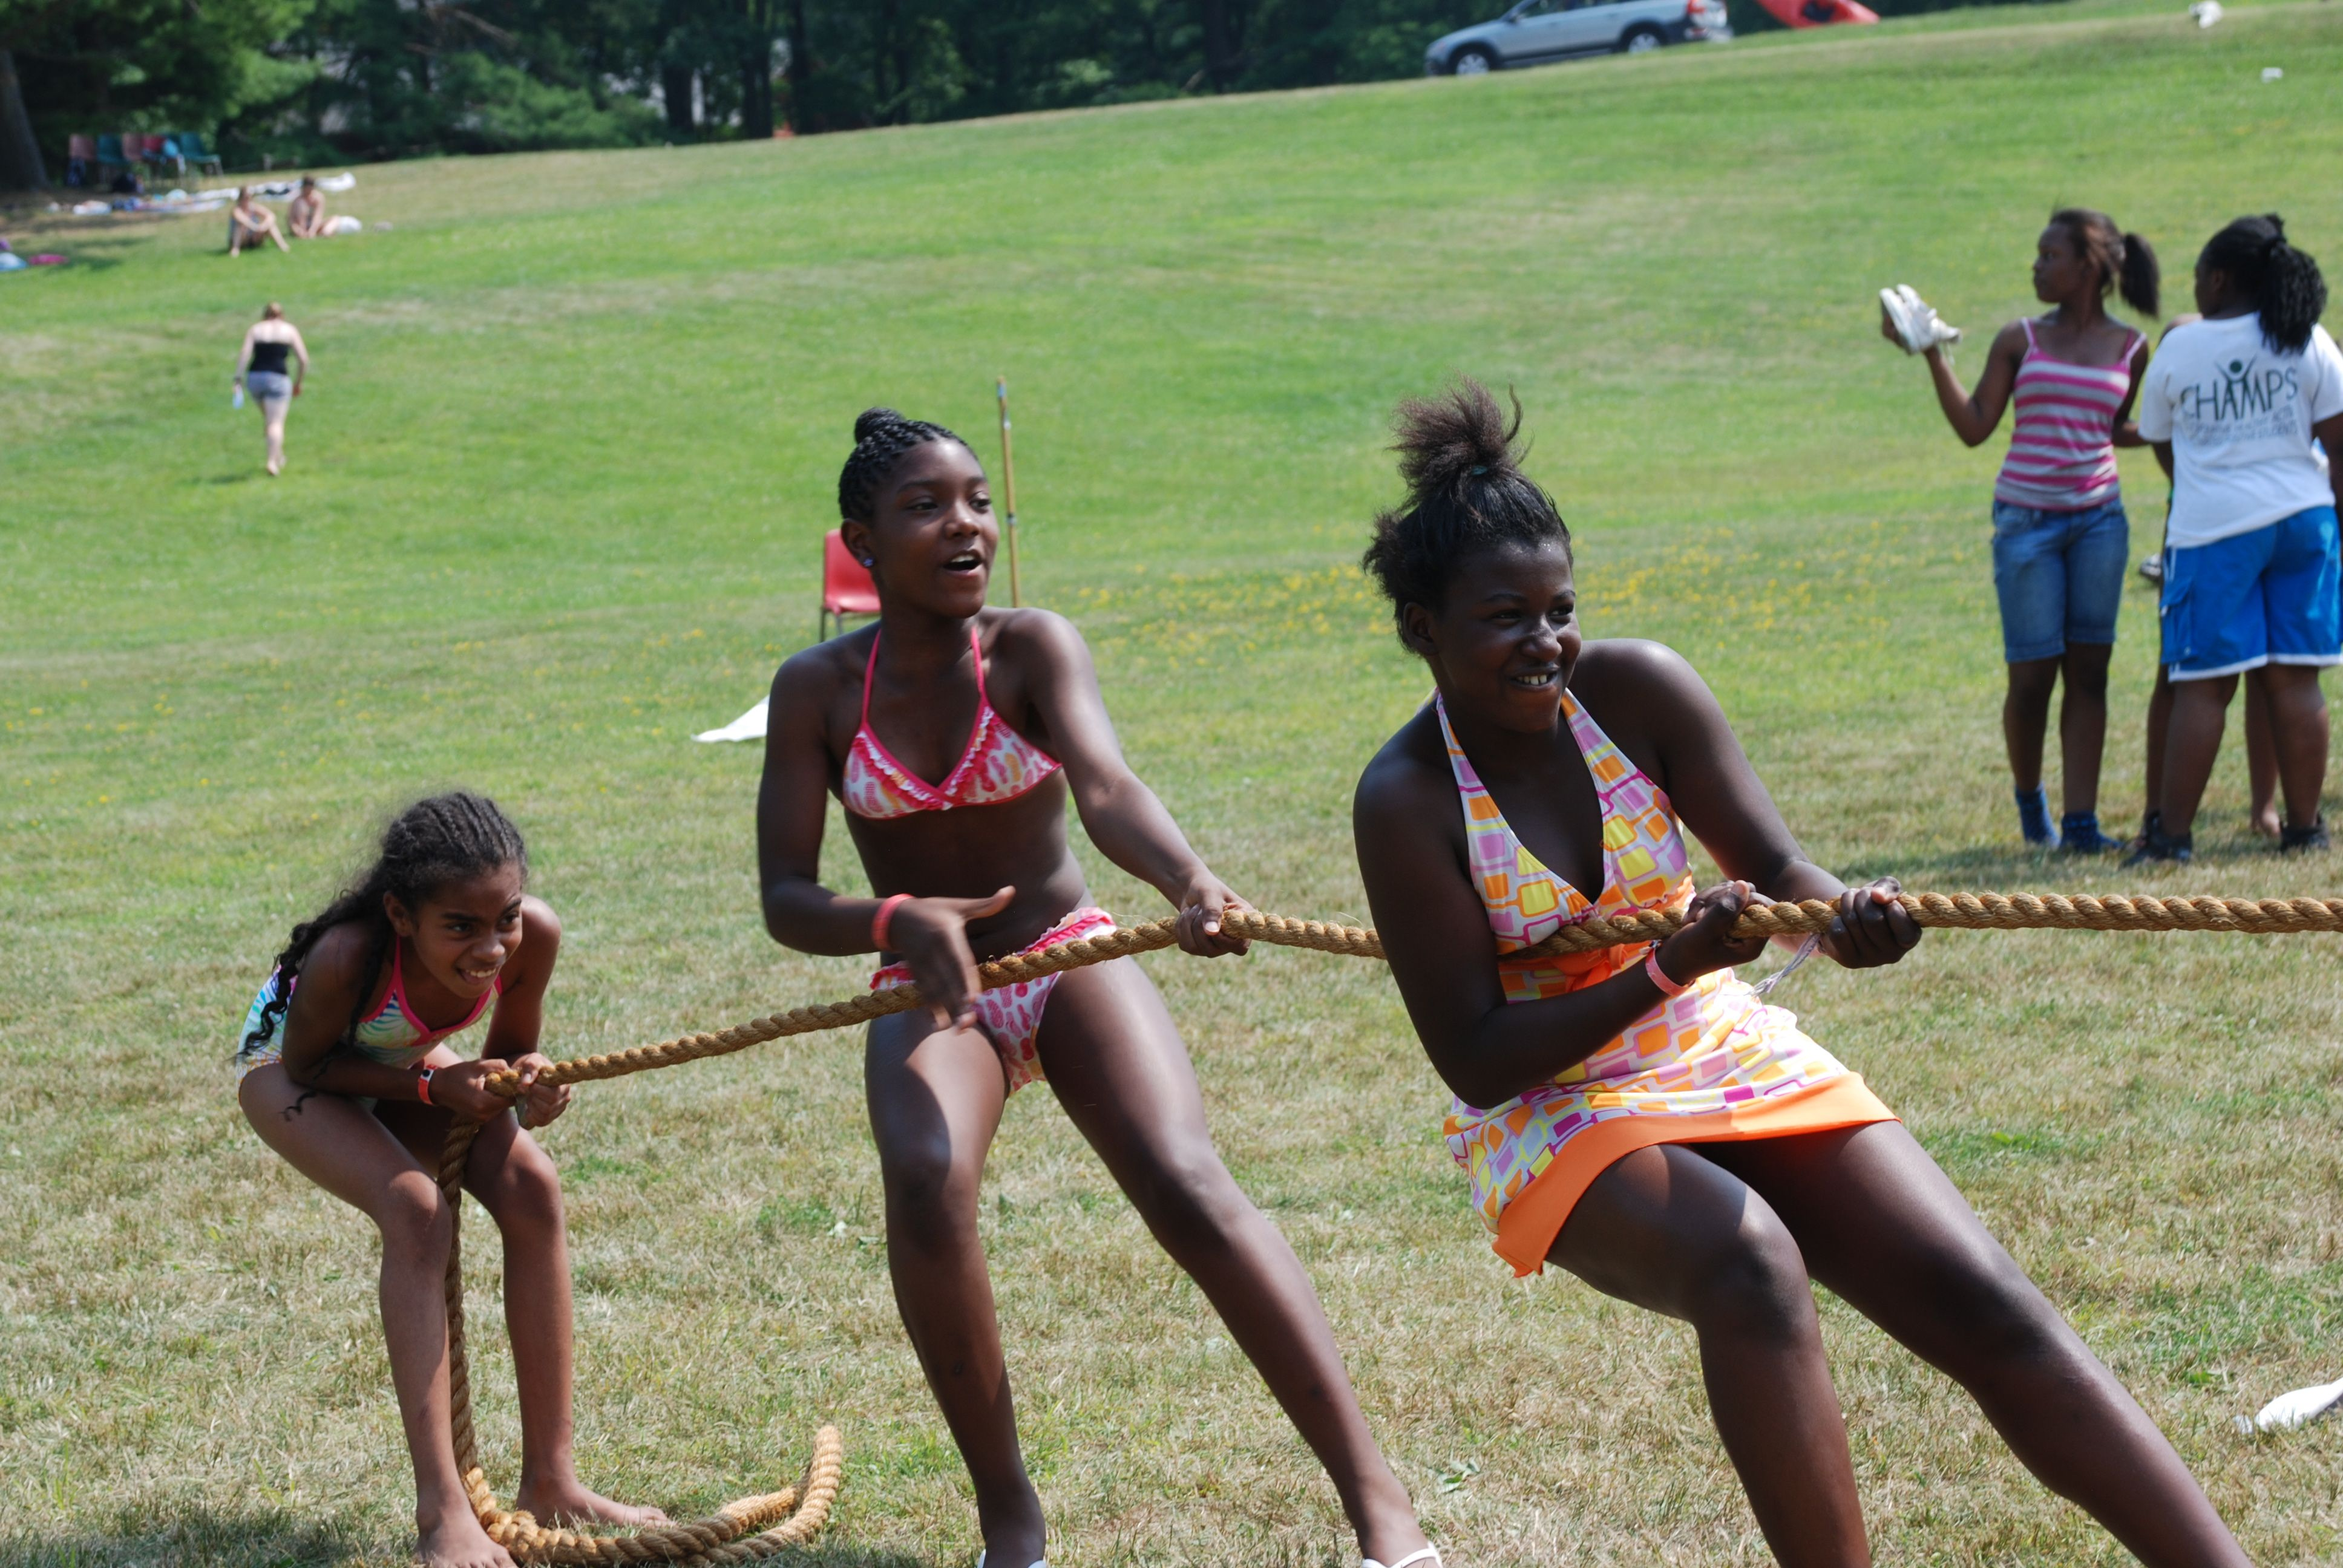 Fresh Air Fund ABC Campers enjoying a game of tug of war